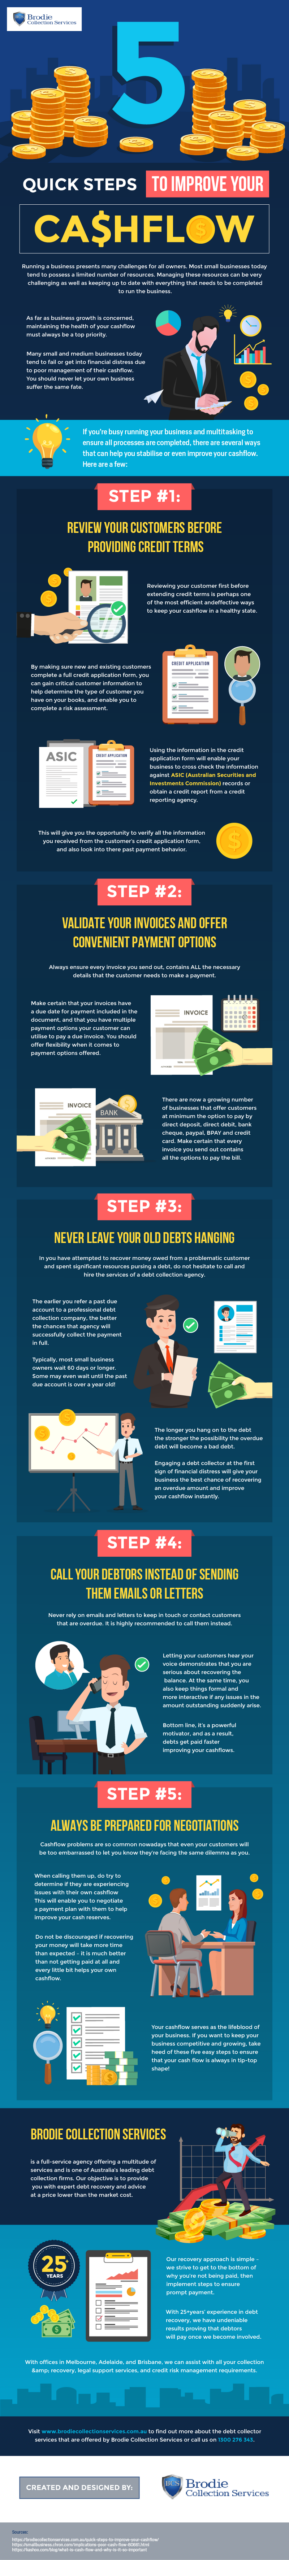 Quick Steps To Improve Your Cashflow